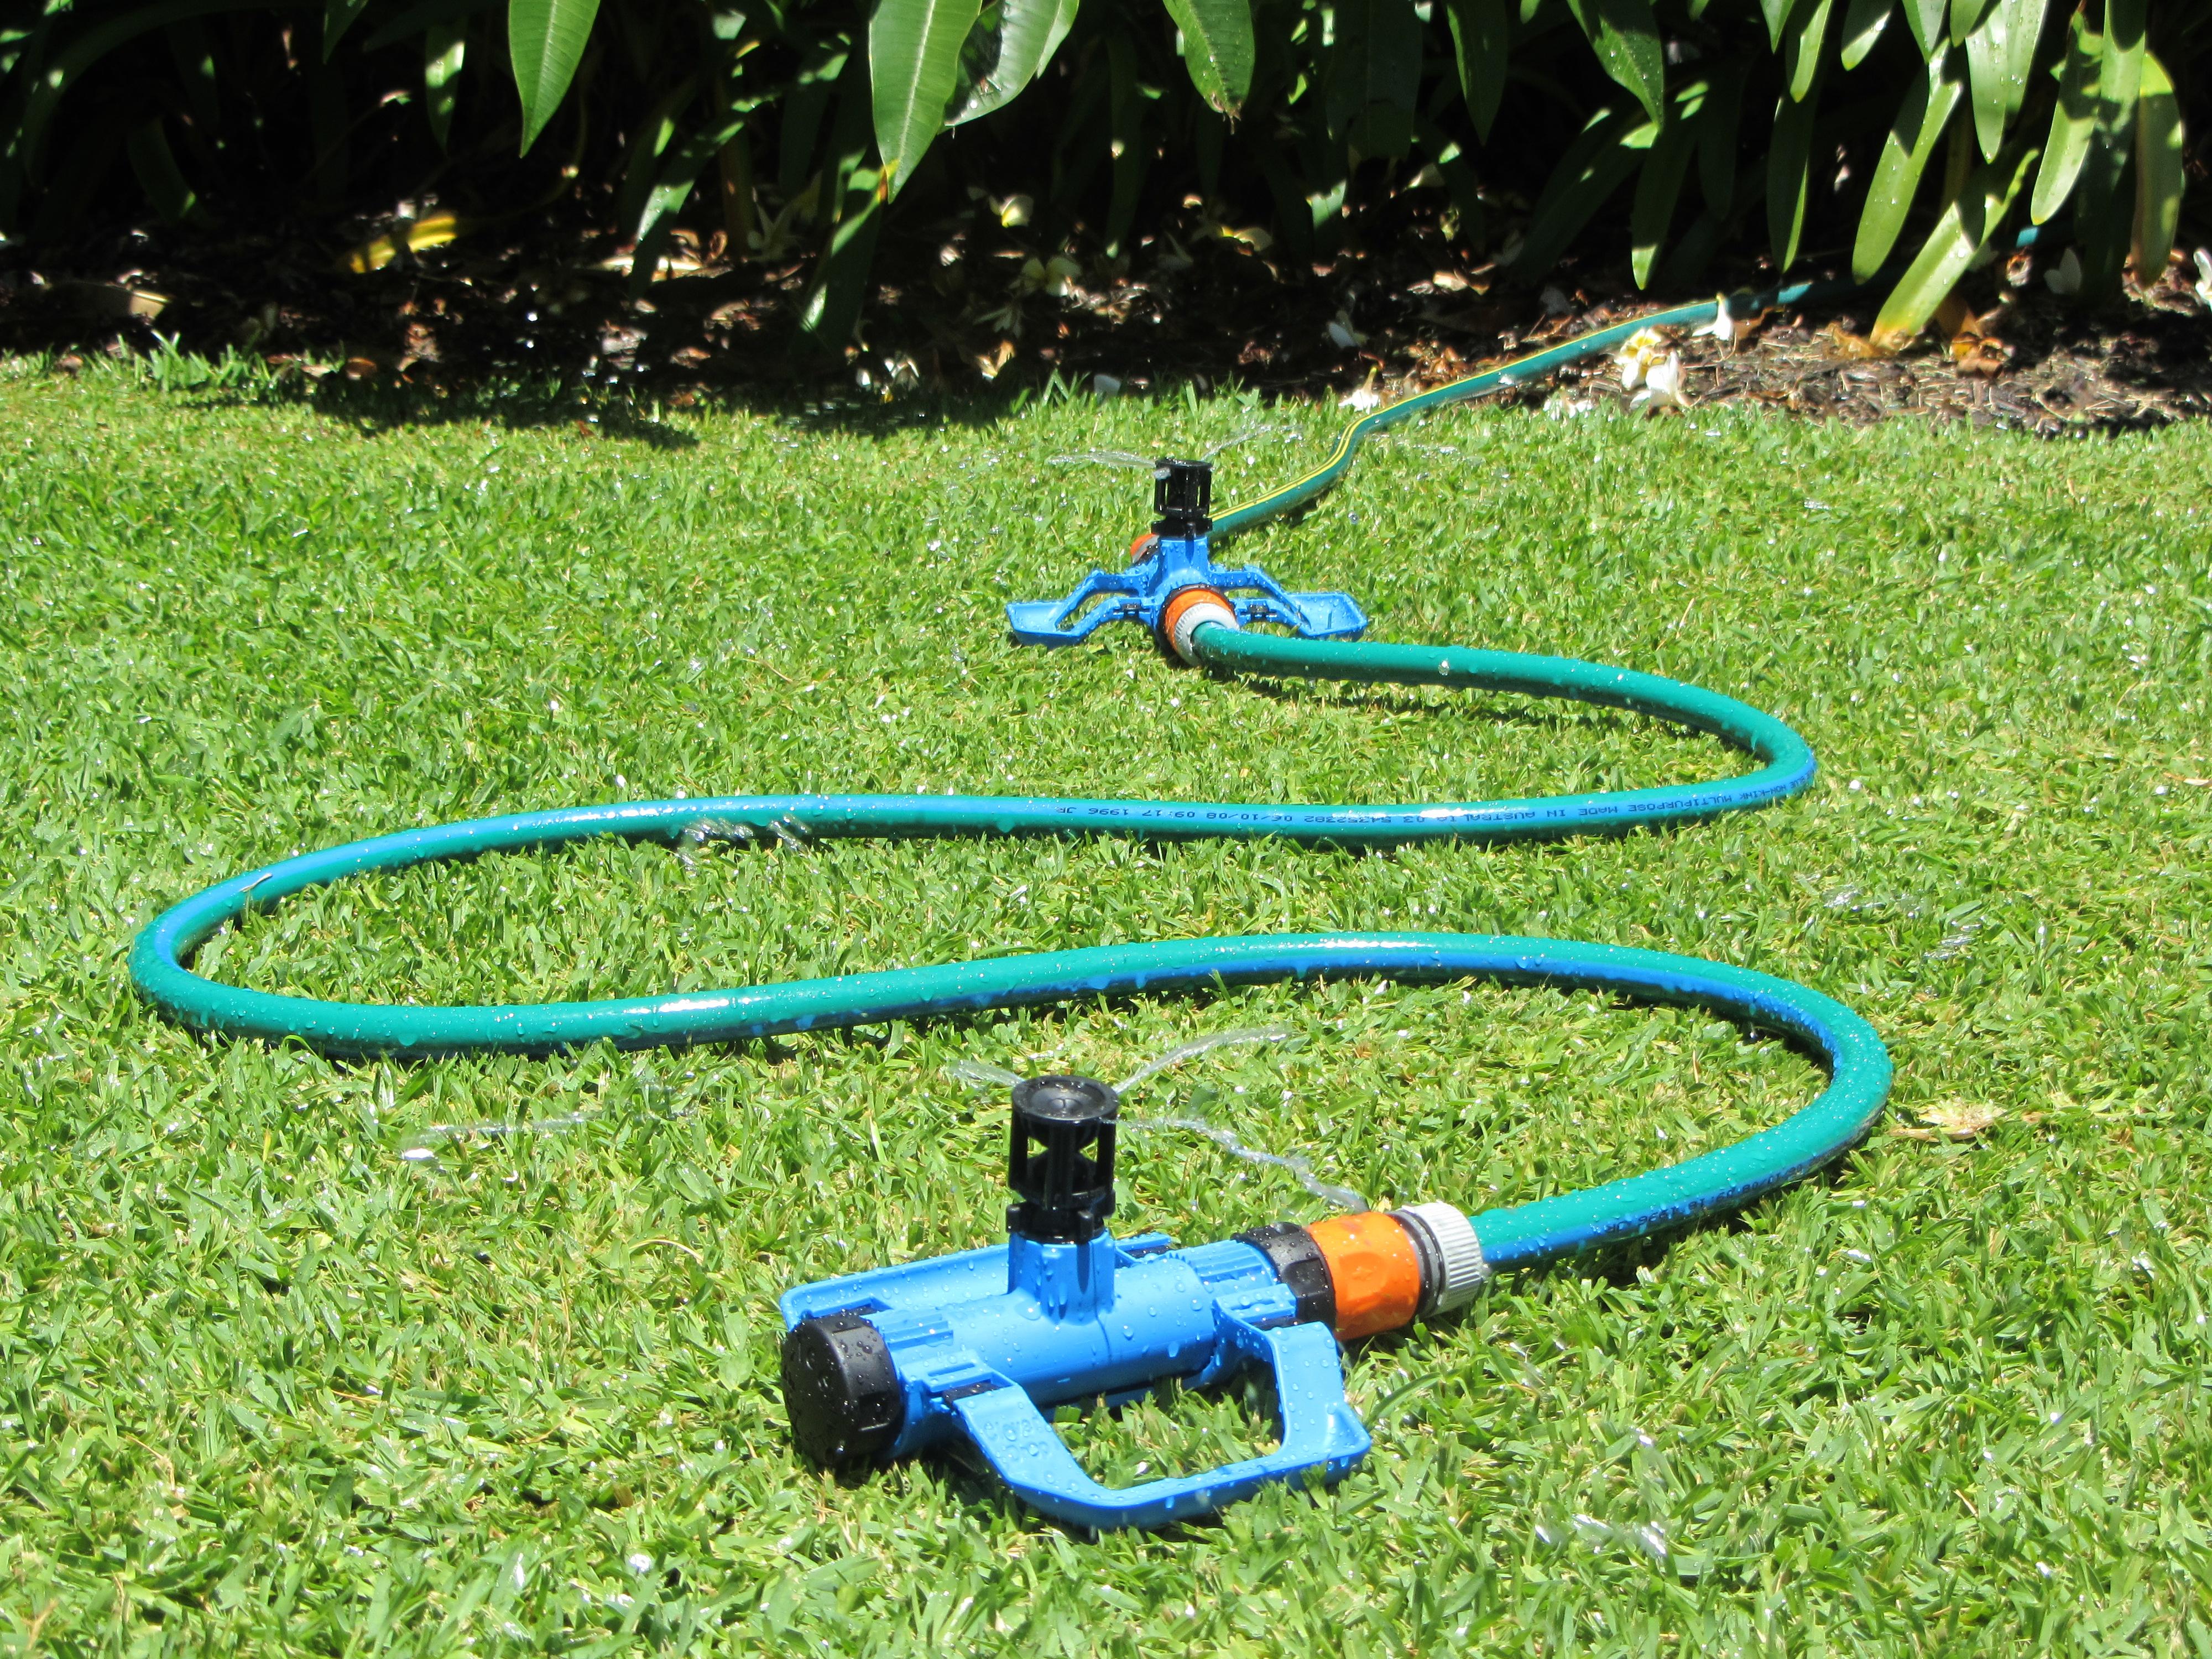 4x Sprinkler Head Clever Drop Gel Top by Wobble-Tee Aussie Made Mini Water Save